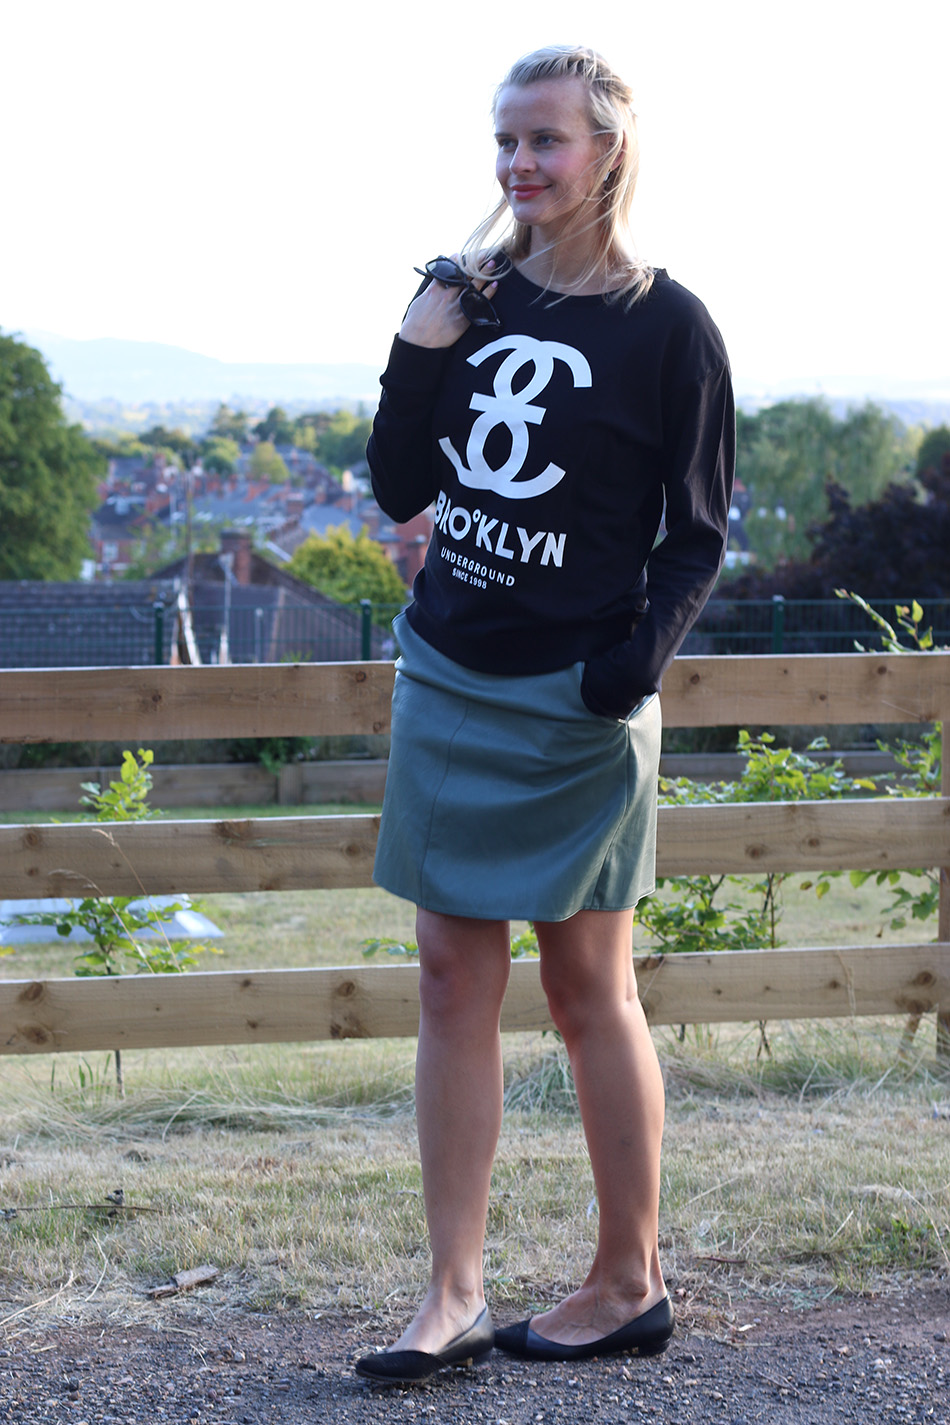 Fringe and Doll Brooklyn Sweatshirt IMG_7544